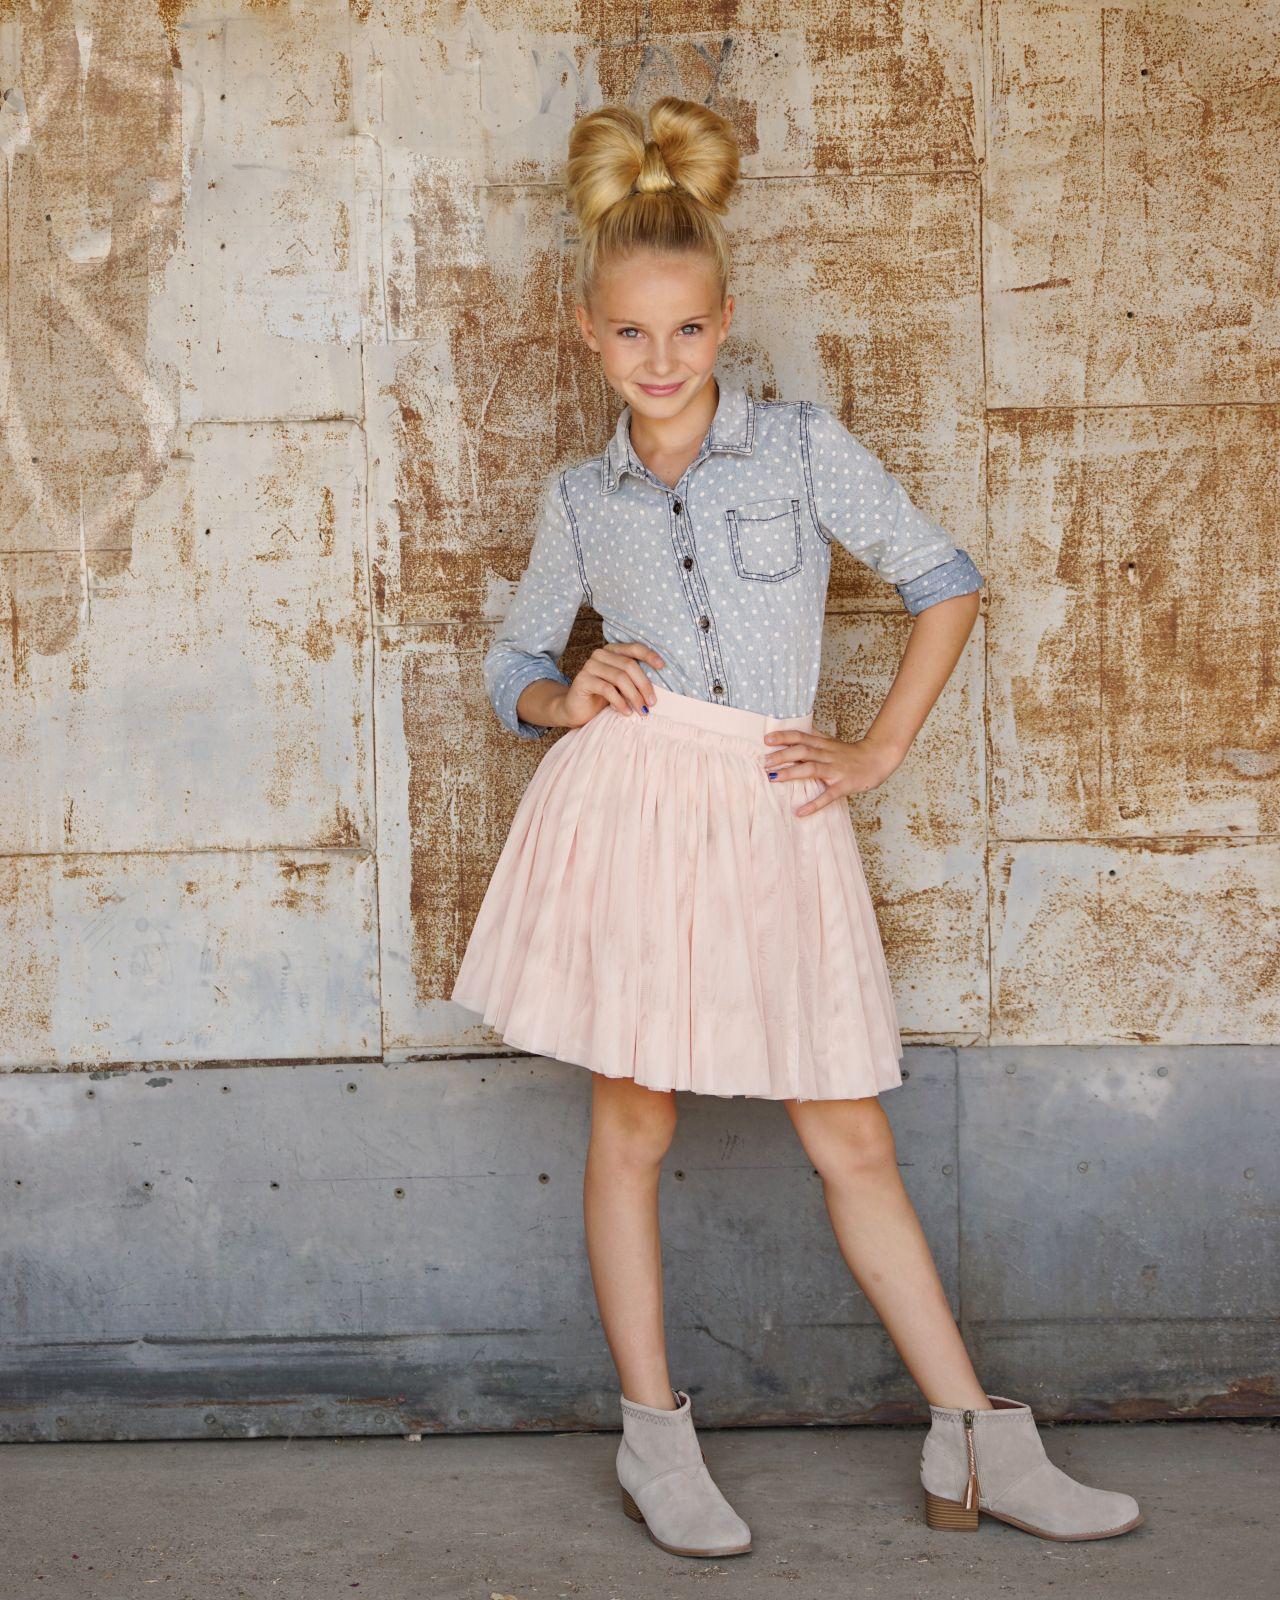 Kids and Tween Fashion Blog, Kids and Tween Fashion Blog ...